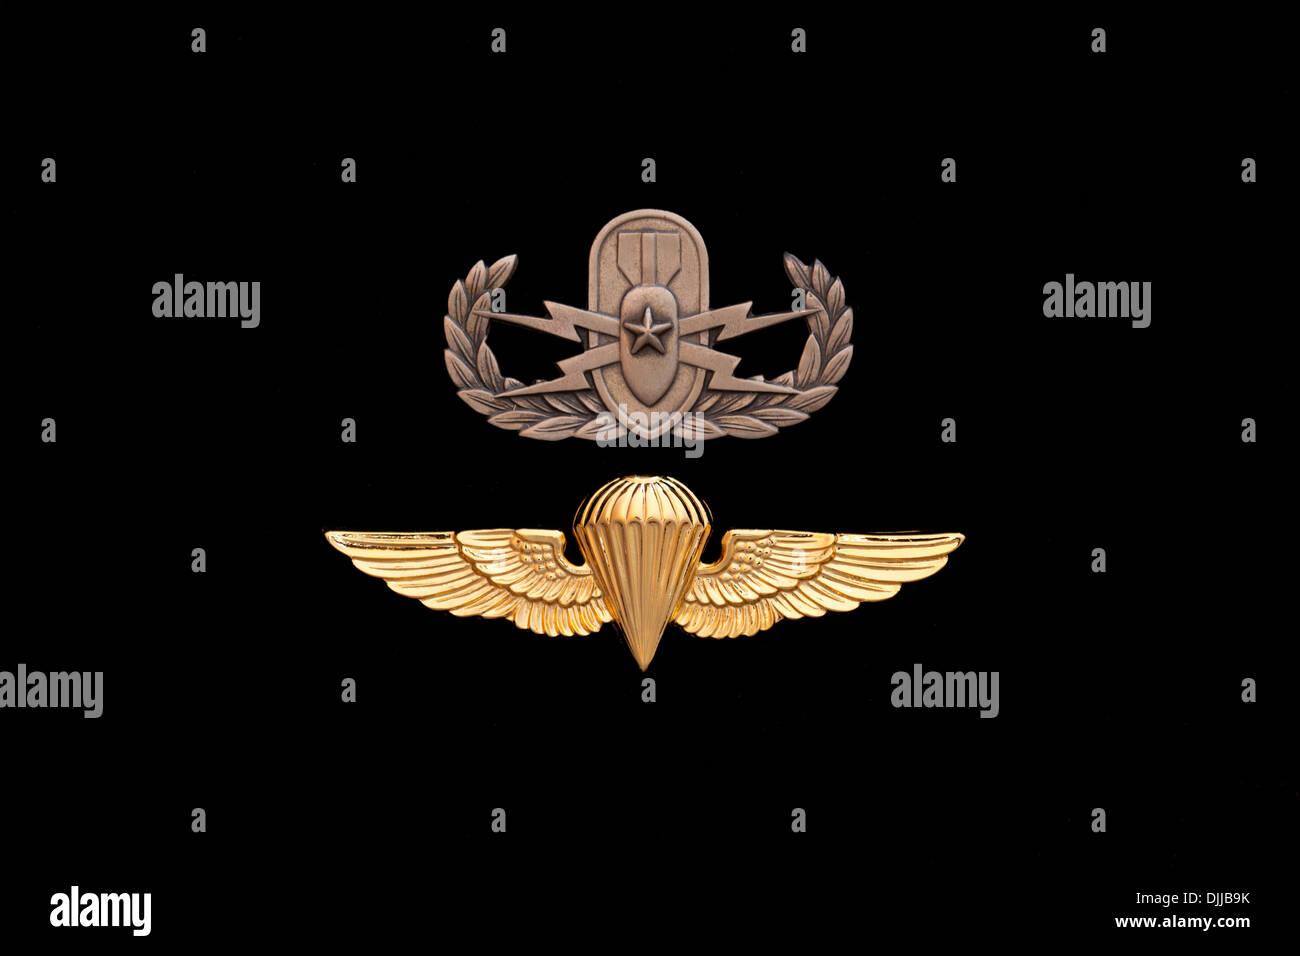 Army Eod Stock Photos Army Eod Stock Images Alamy